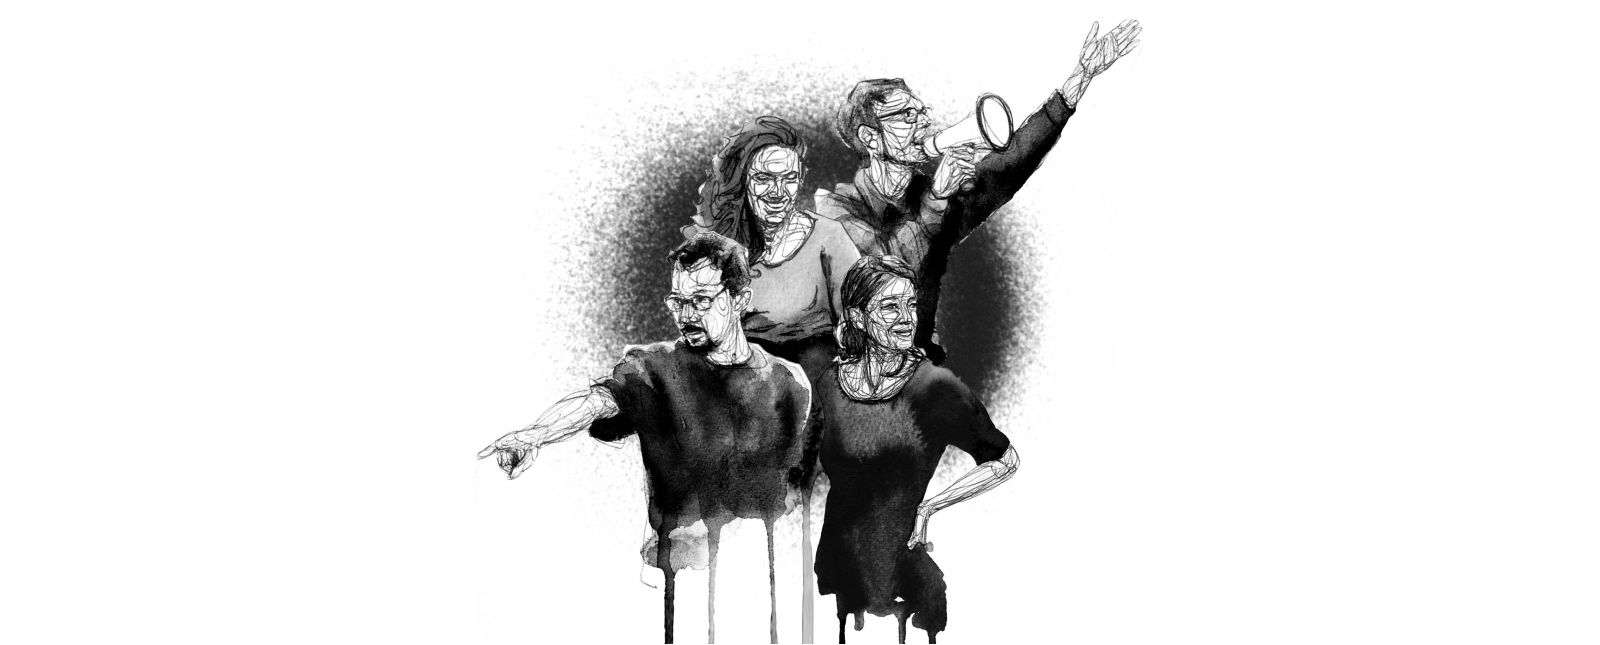 Team Junges Theater // Graham Smith // I. Kammerer // M. Kaiser // A.-L. Schuppe //  2021 // Illustration: Michael Genter